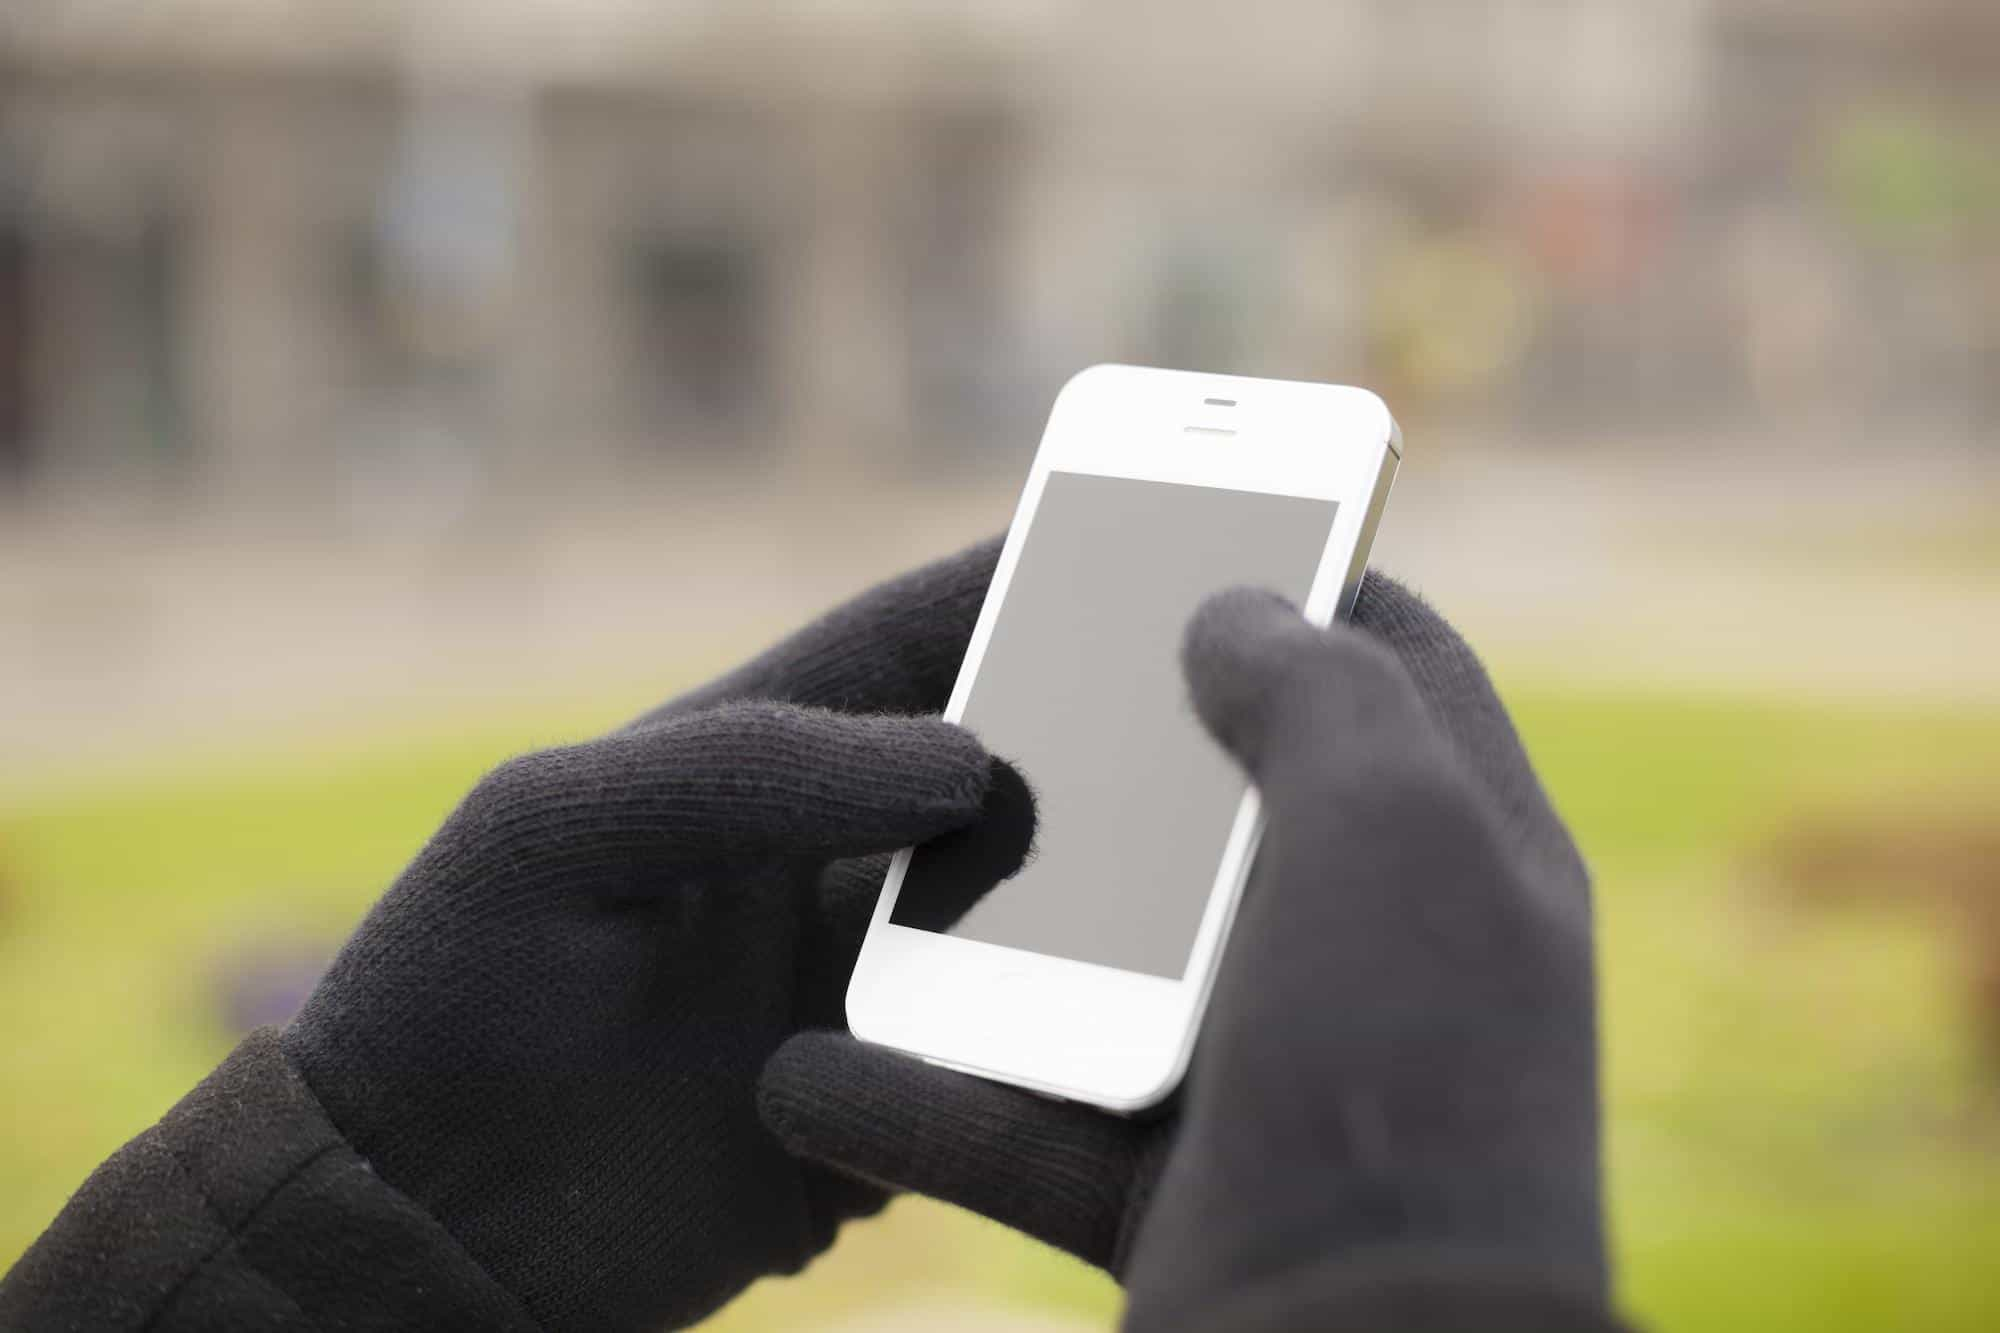 Gloves for phones